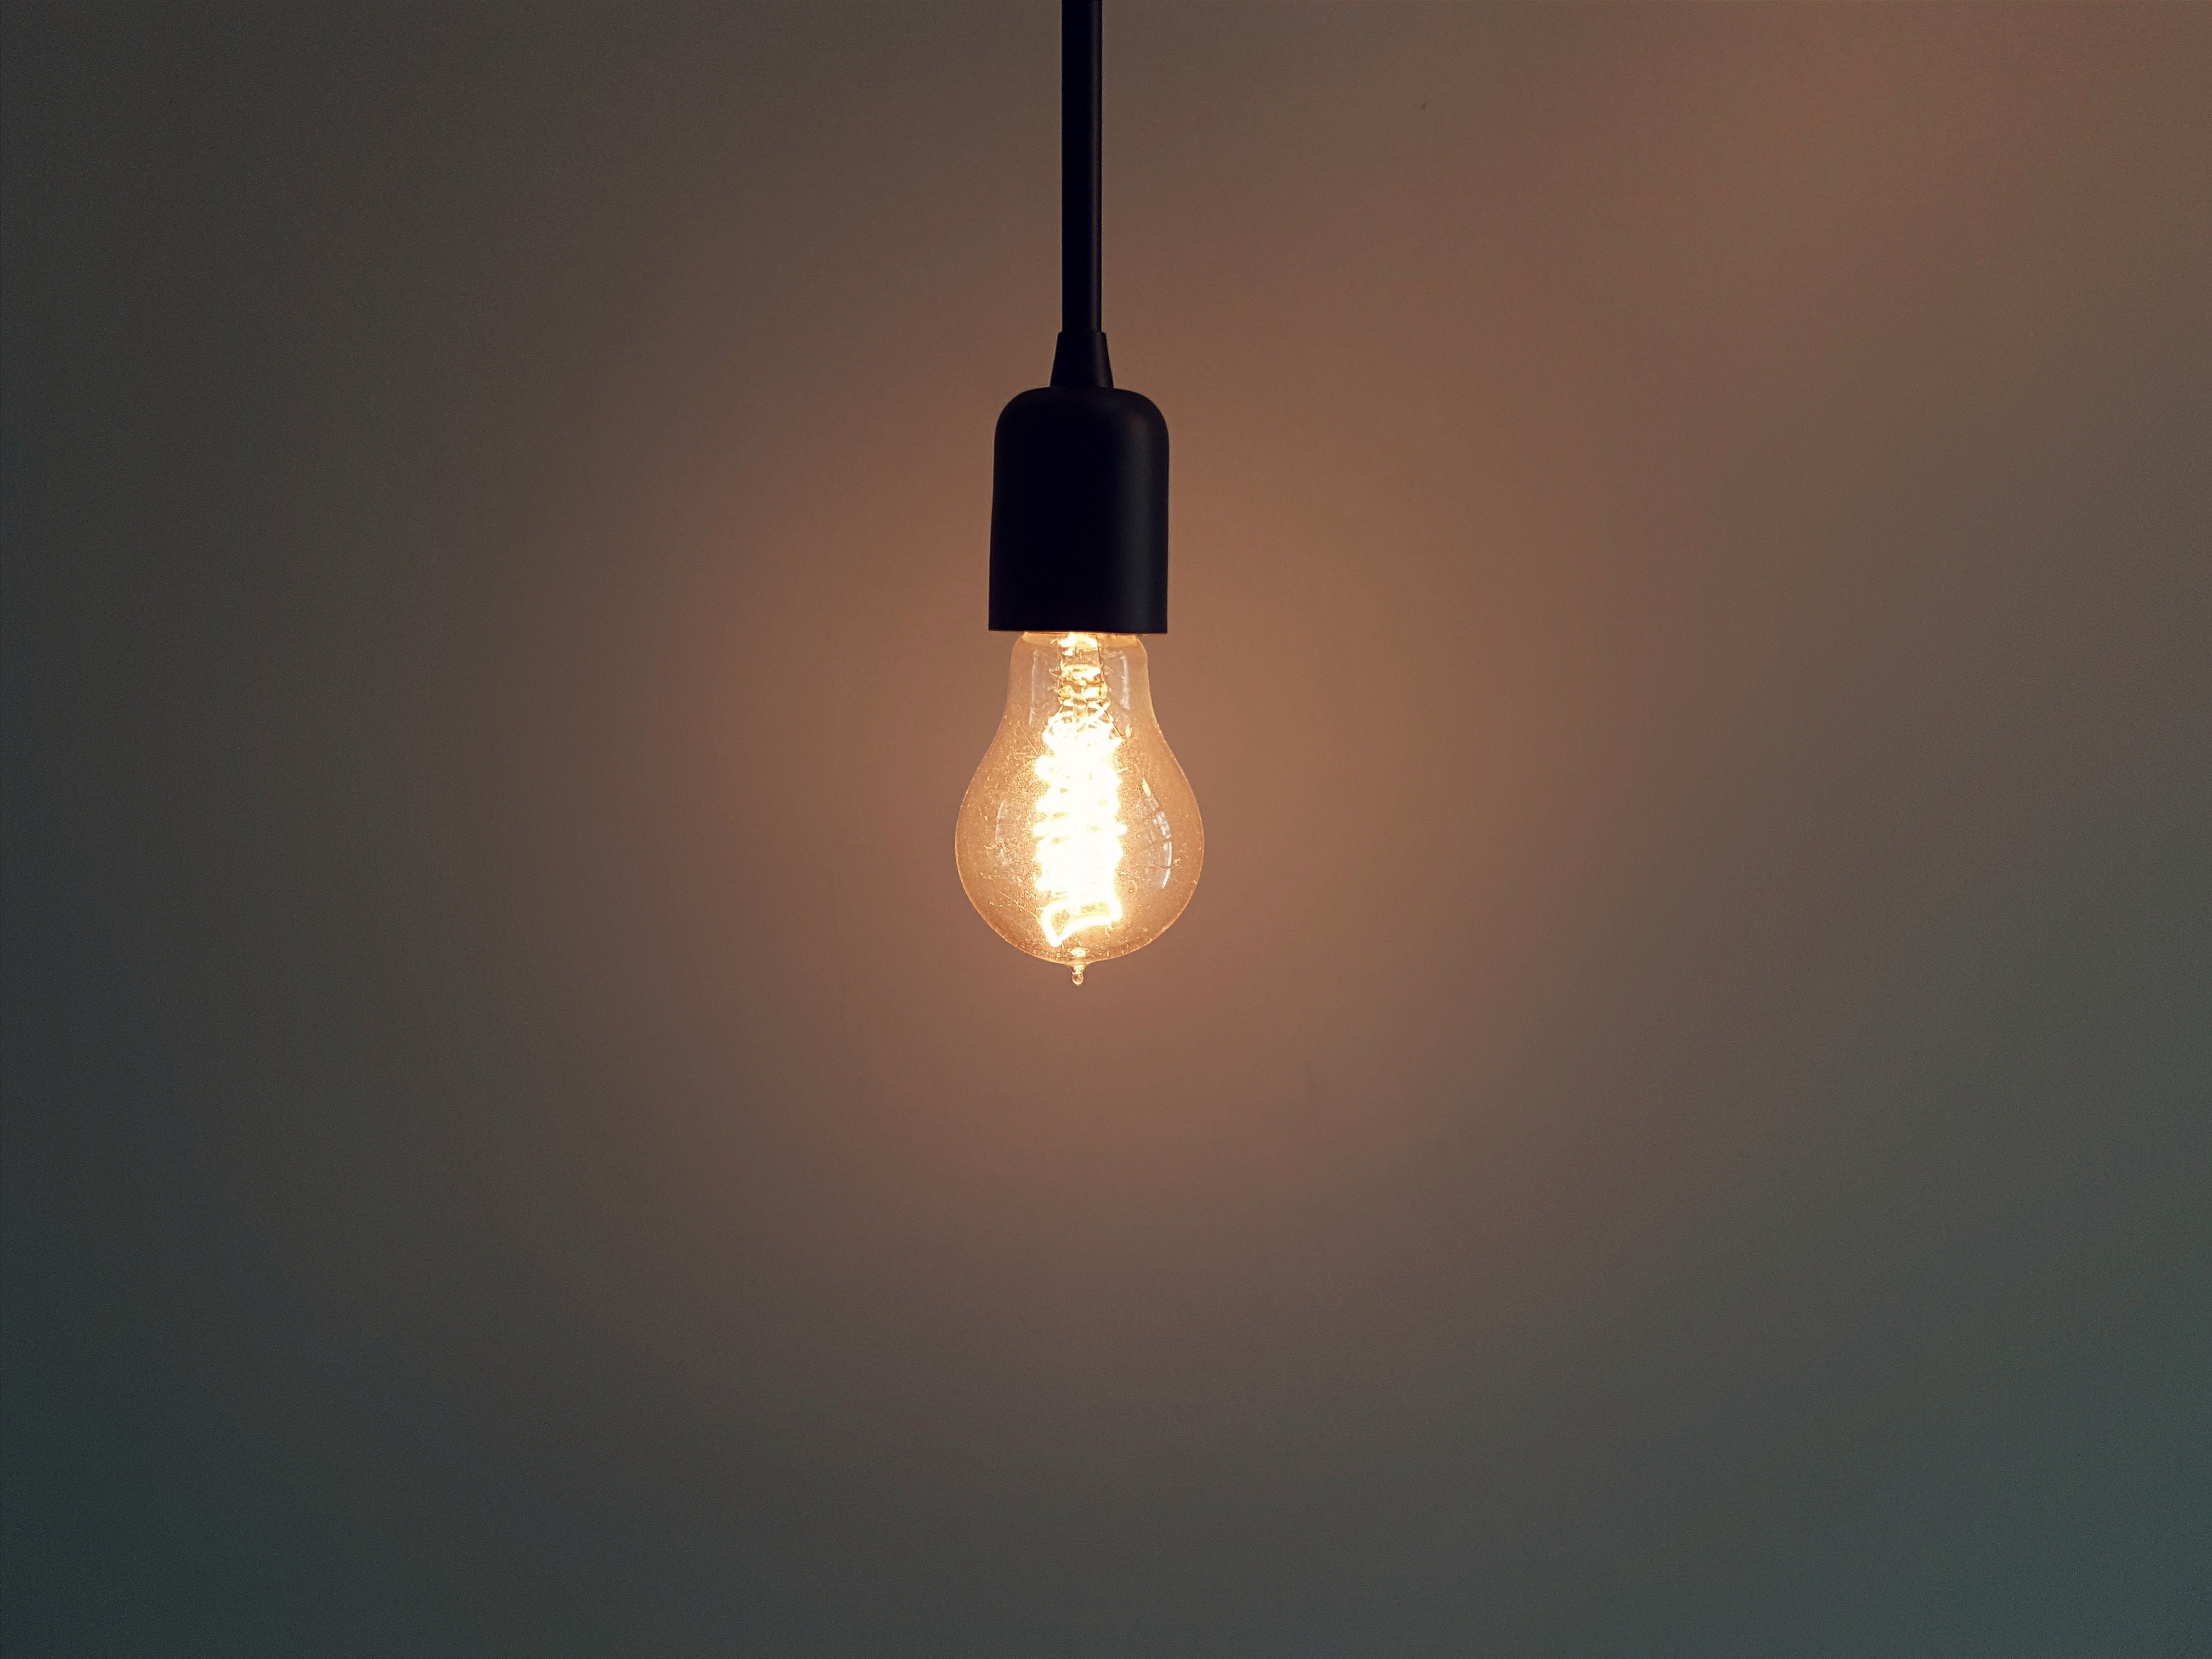 Dark room with light bulb - Turned On Pendant Lamp